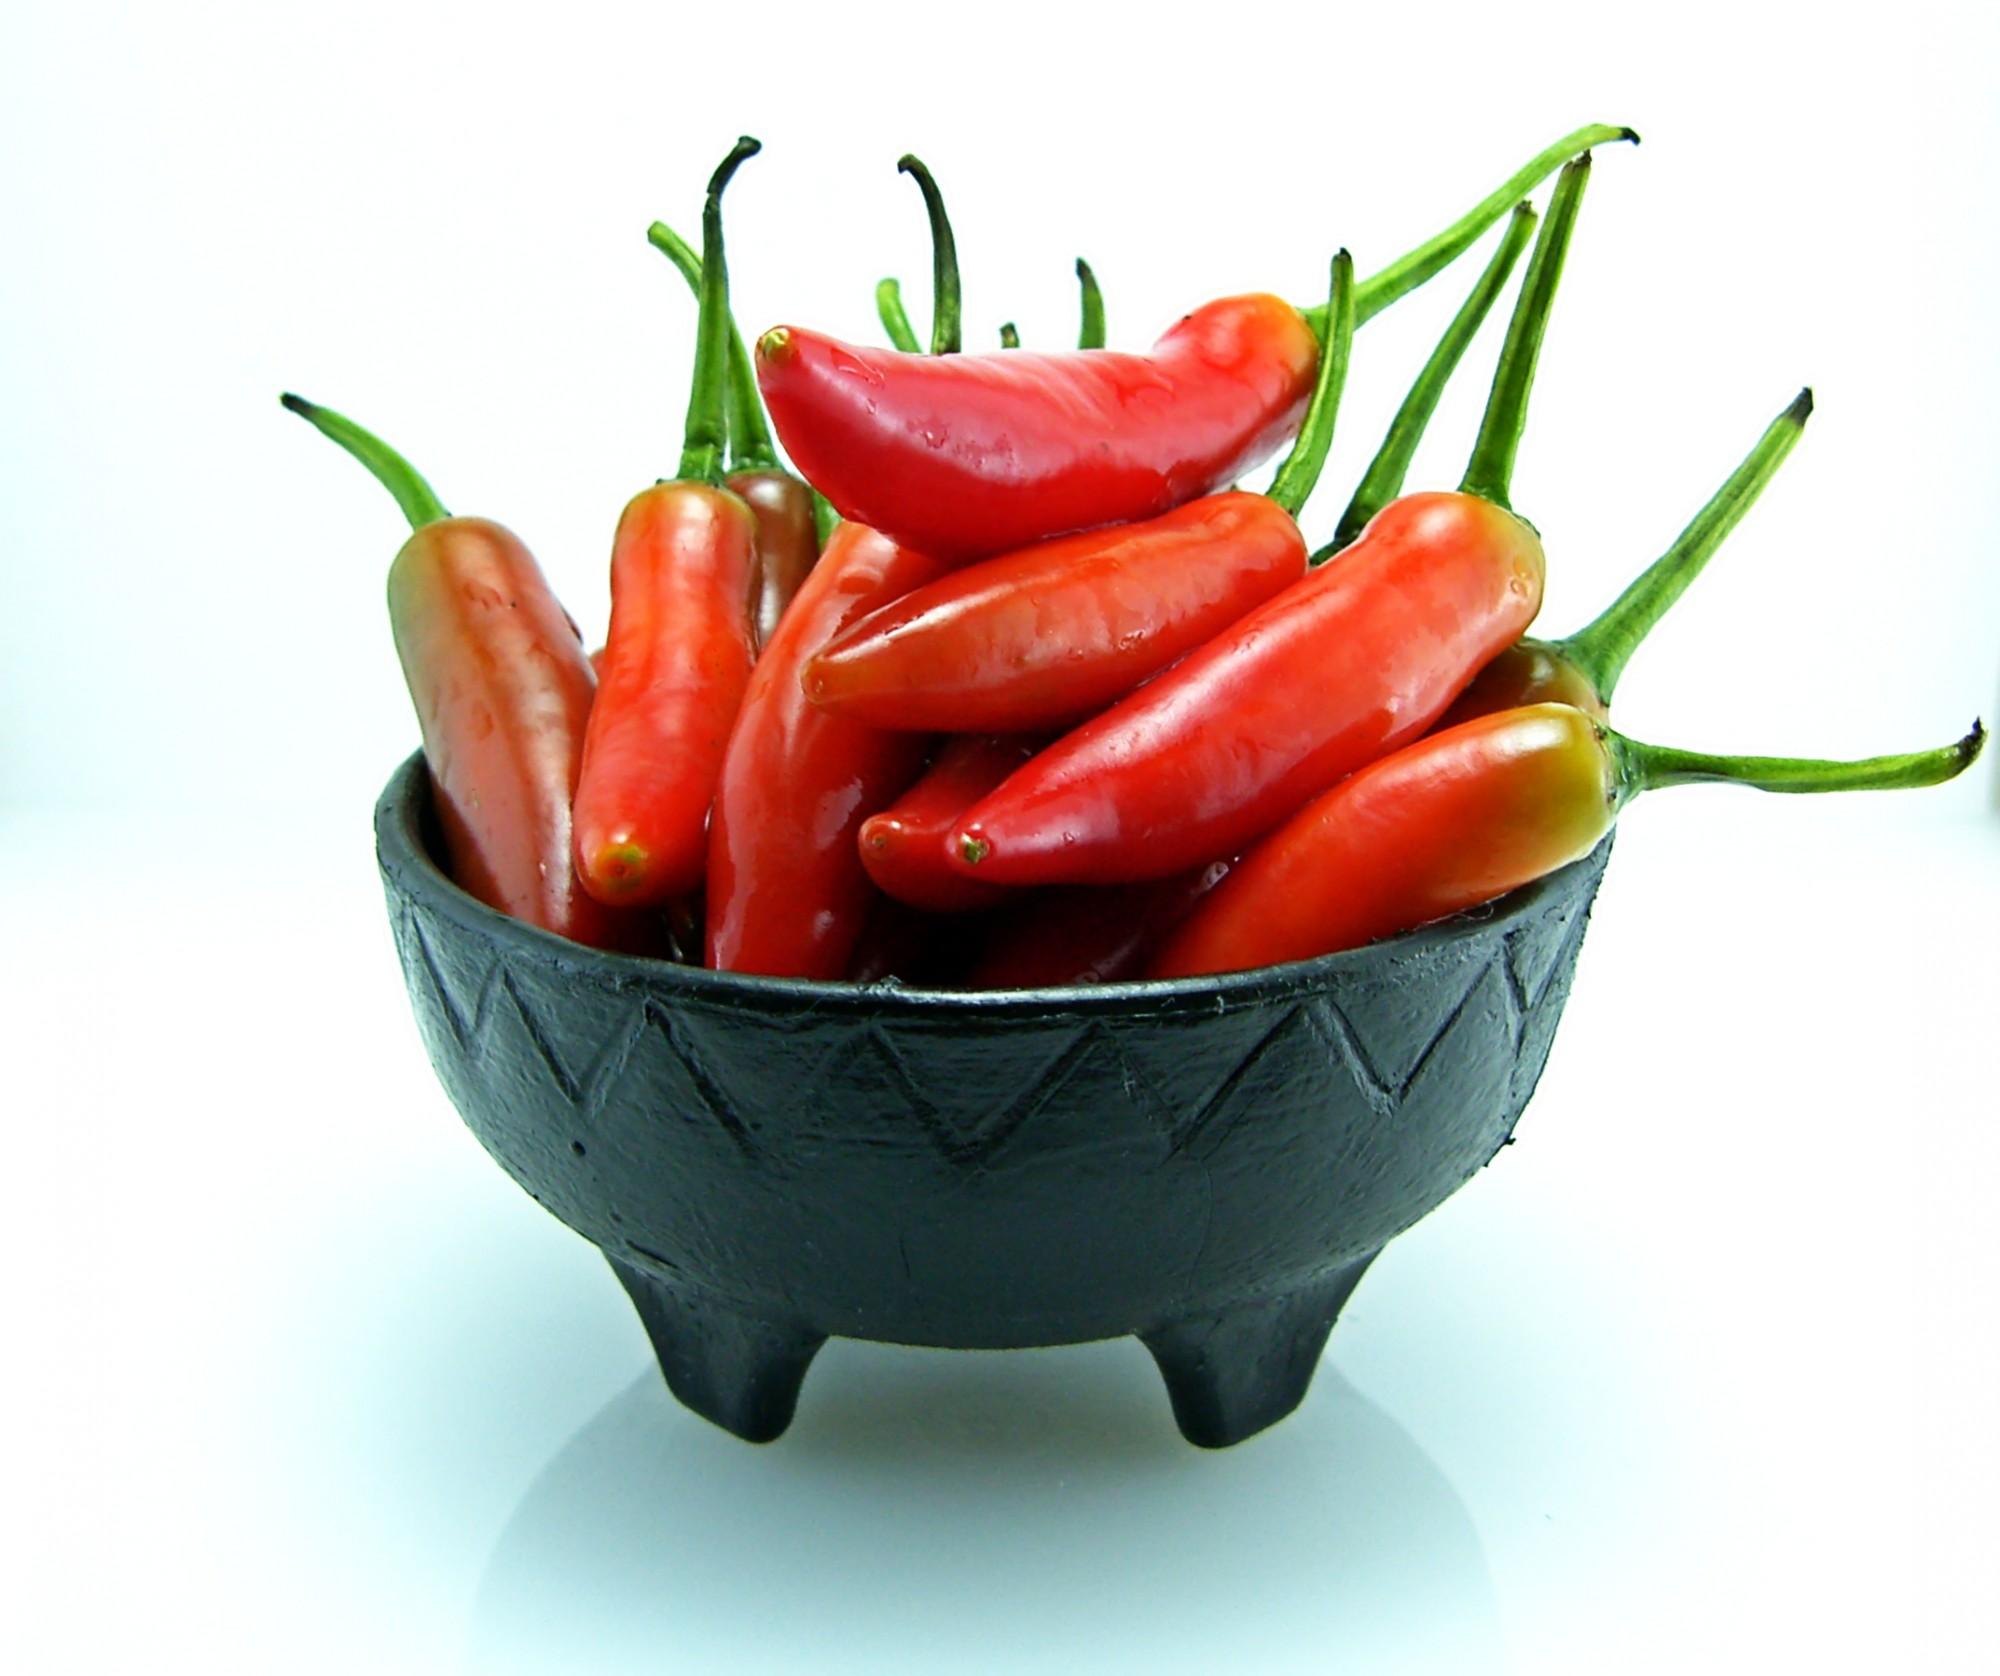 Miska plná čerstvého chilli